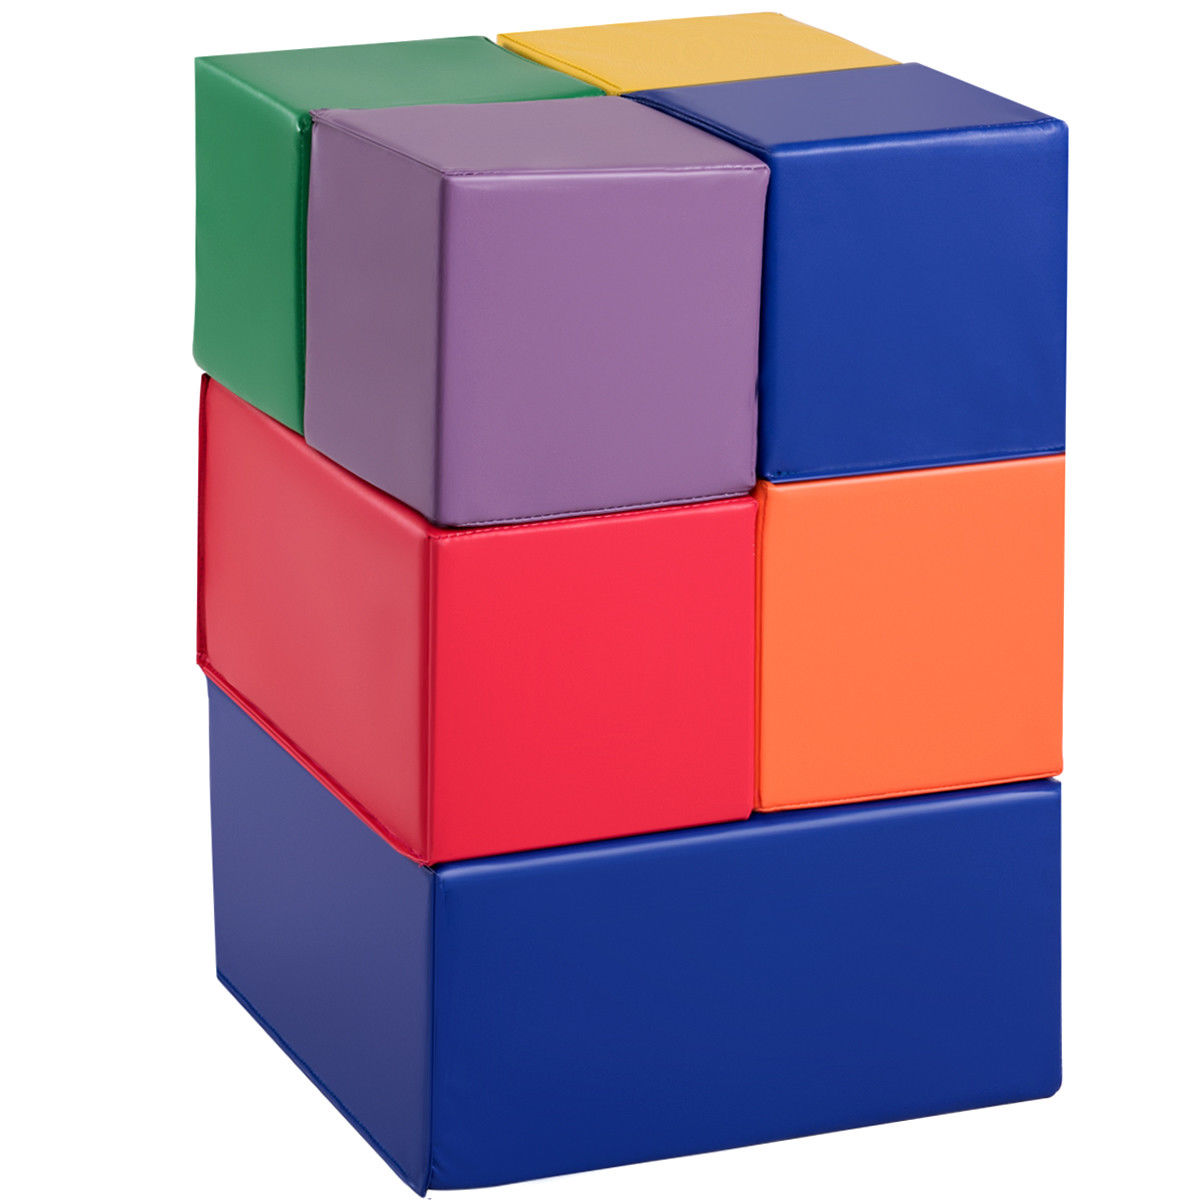 Gymax 7 Piece Set Pu Foam Big Building Blocks Colorful